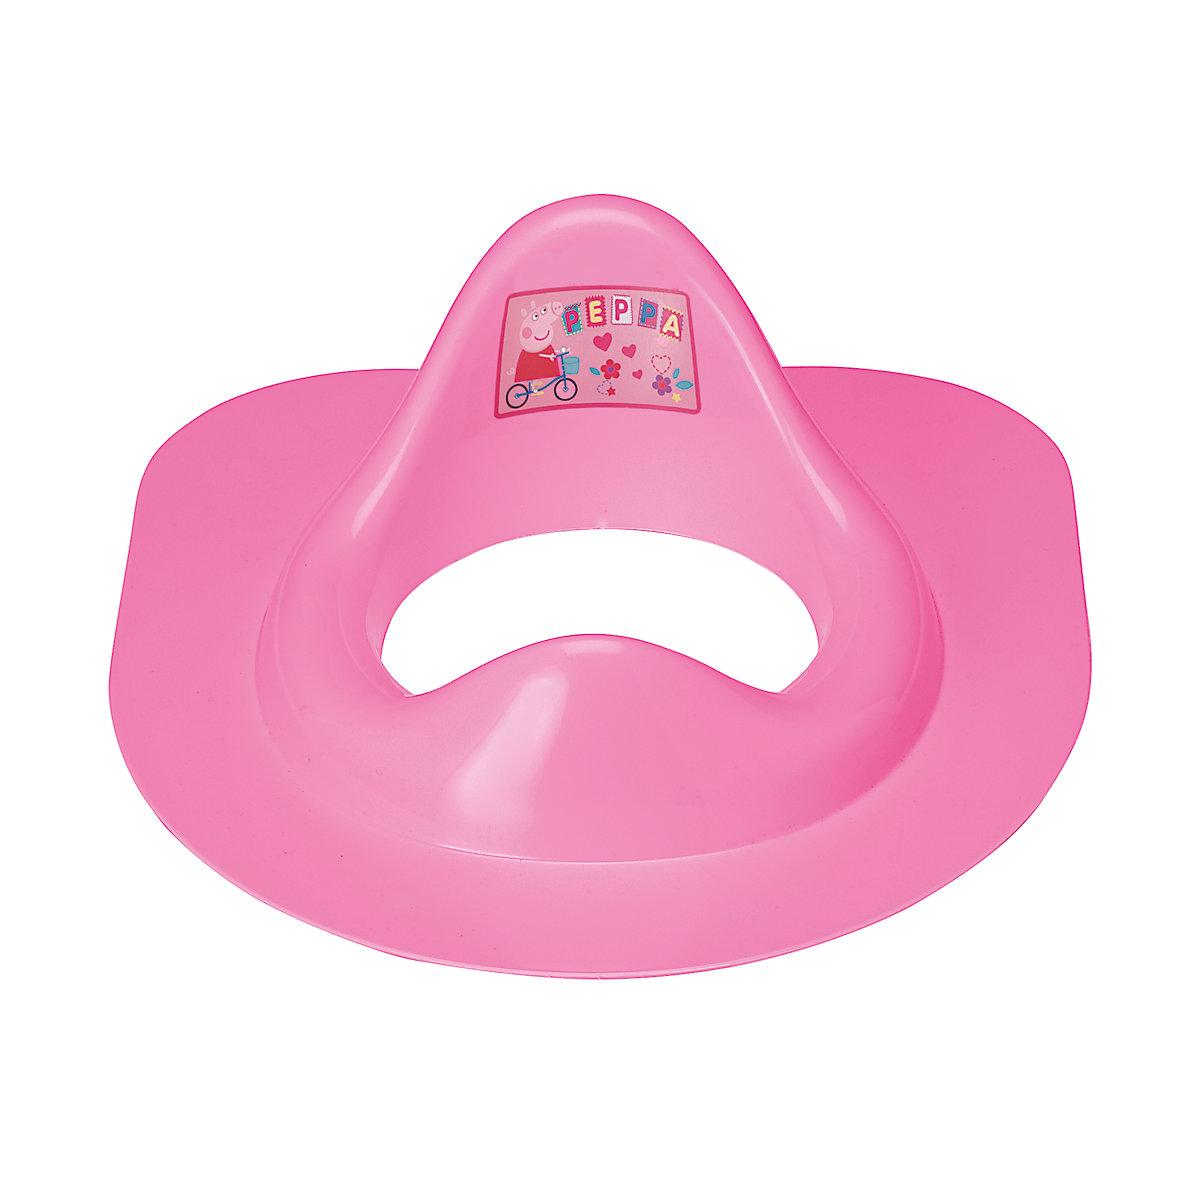 'Peppa Pig Toilet Training Seat